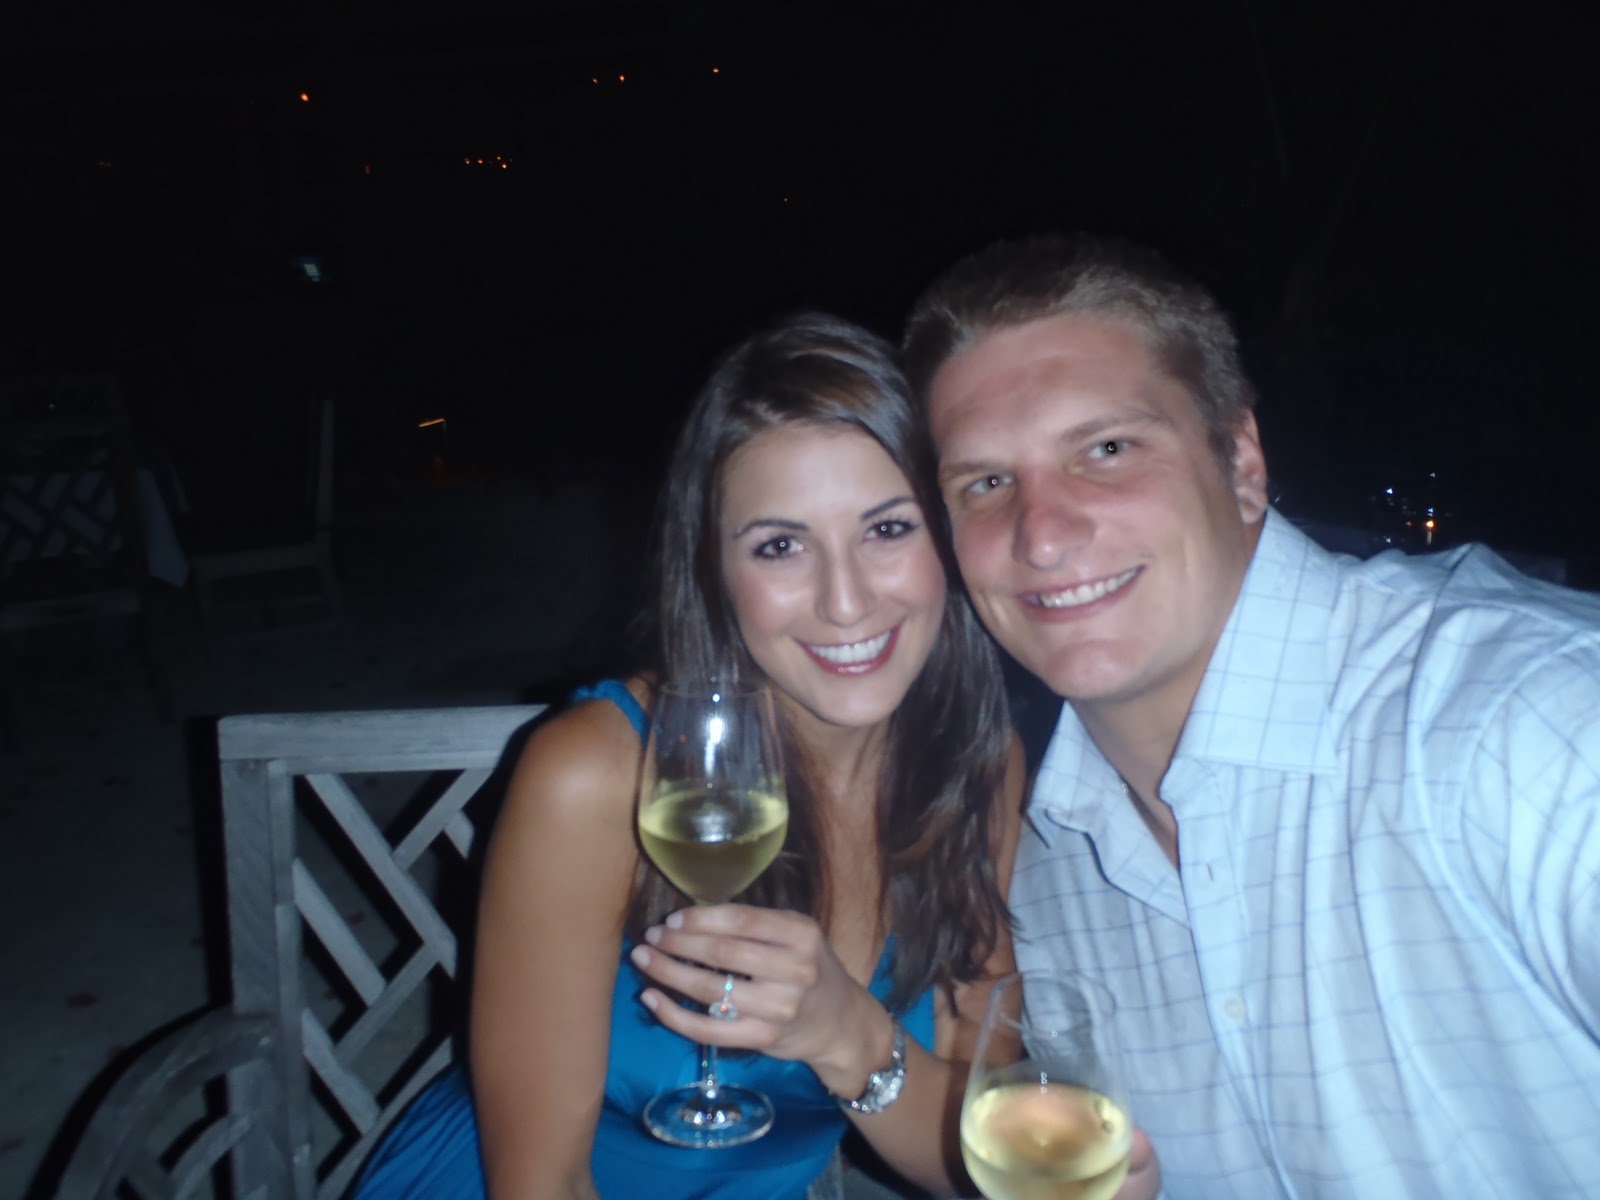 Jeff Rohrer Wedding Photos: Retired NFL Player Marries ...